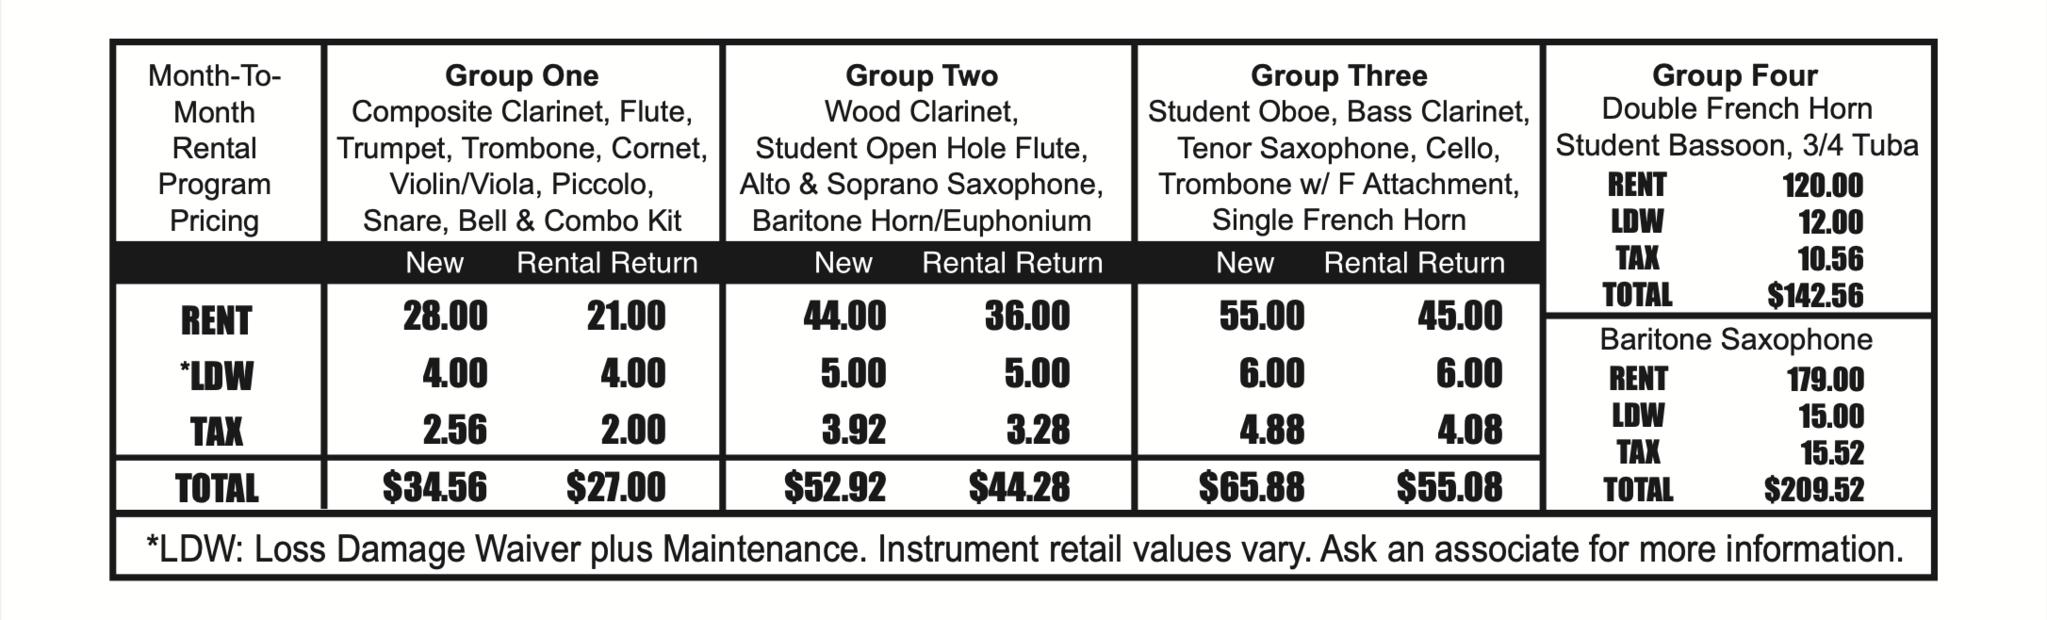 Sims Music Rental Rates